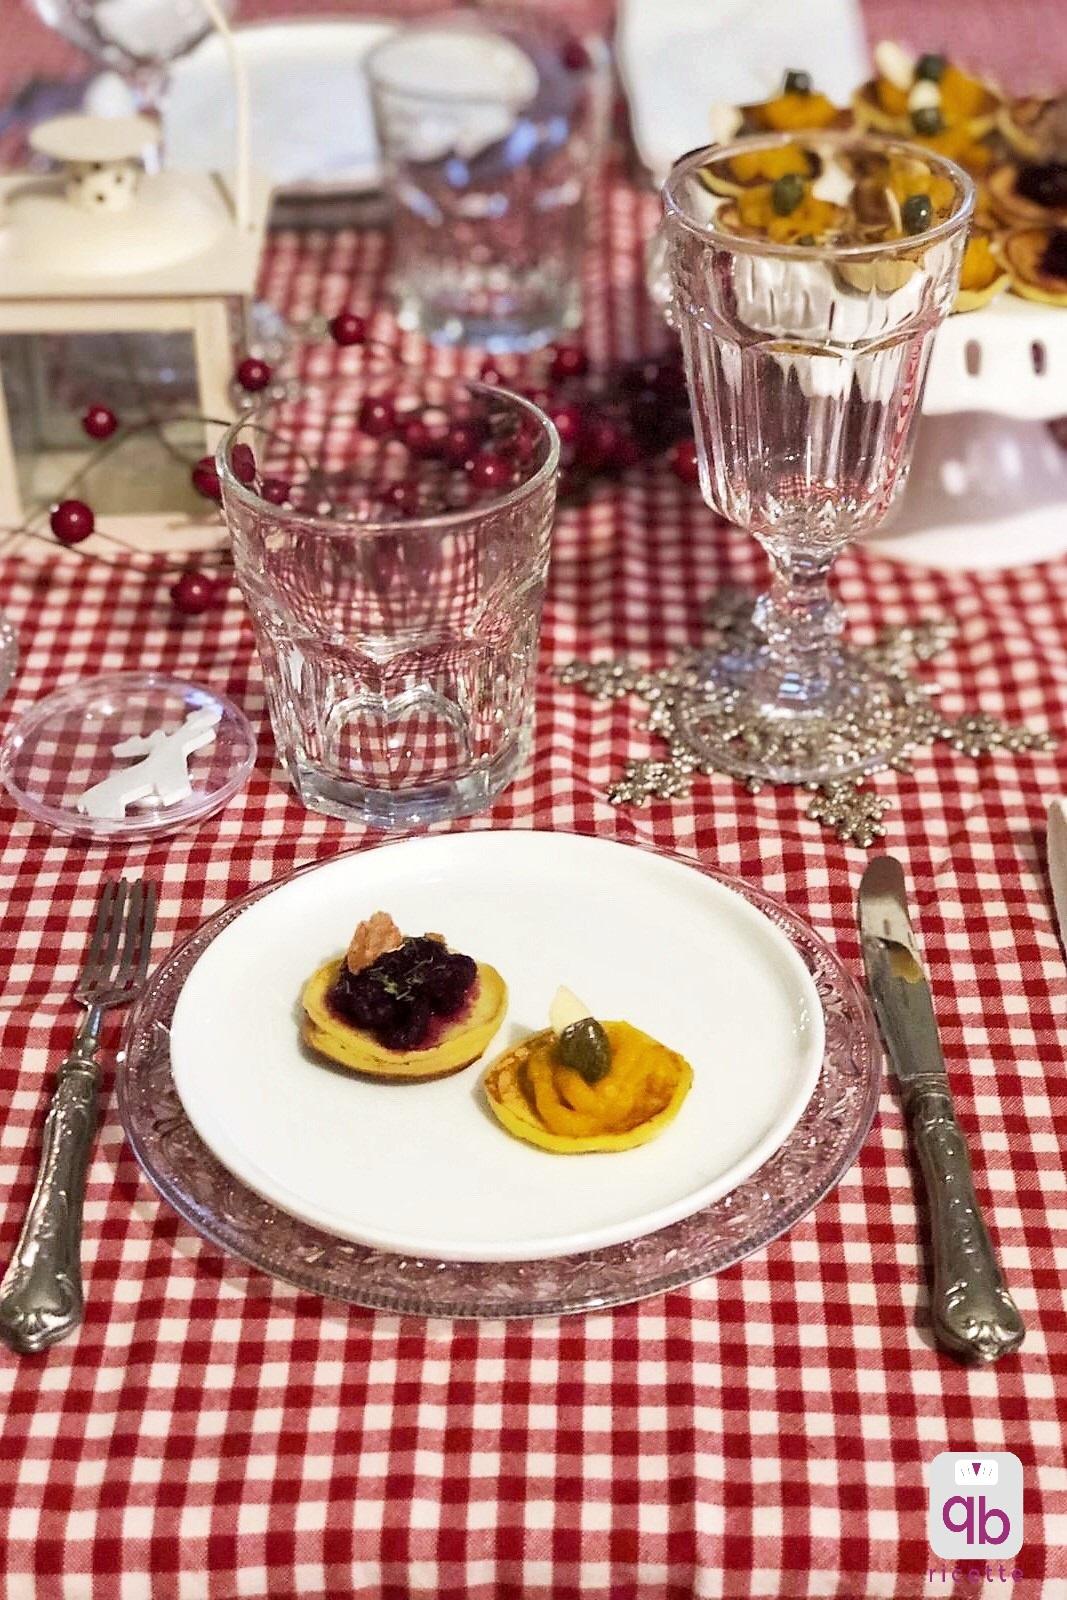 Antipasto Di Natale Leggero.Mini Pancakes Salati Un Antipasto Leggero Per Natale Qb Ricette